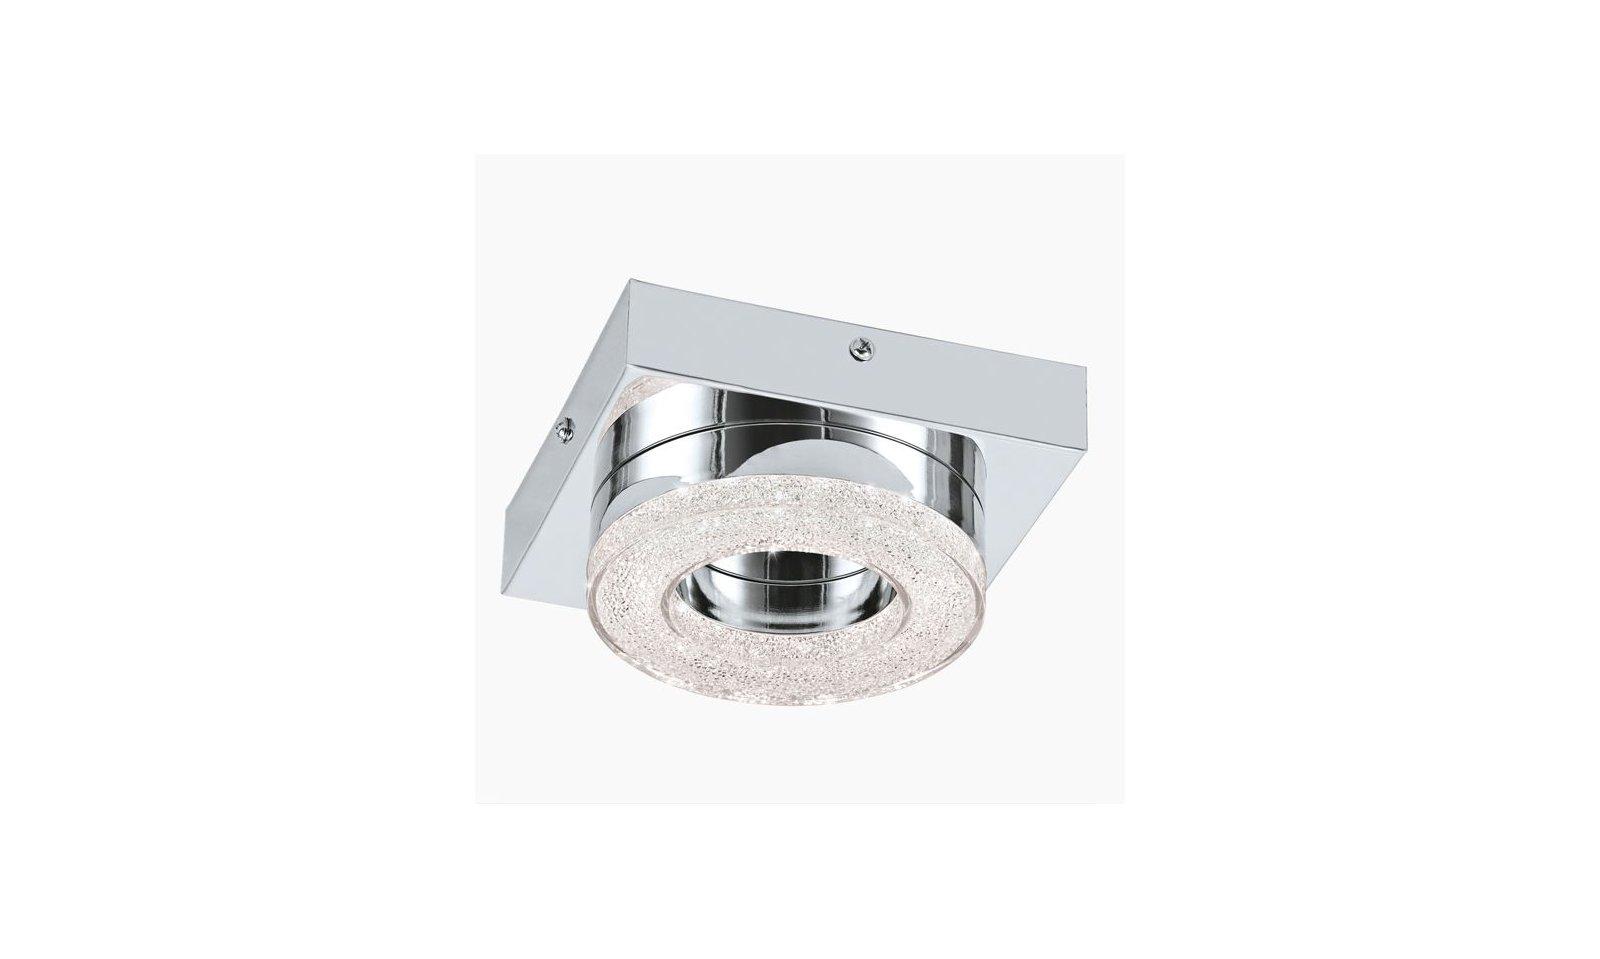 Eglo Plafoniera Led : Eglo fradelo plafoniera o applique led circolare in acciaio e plastica